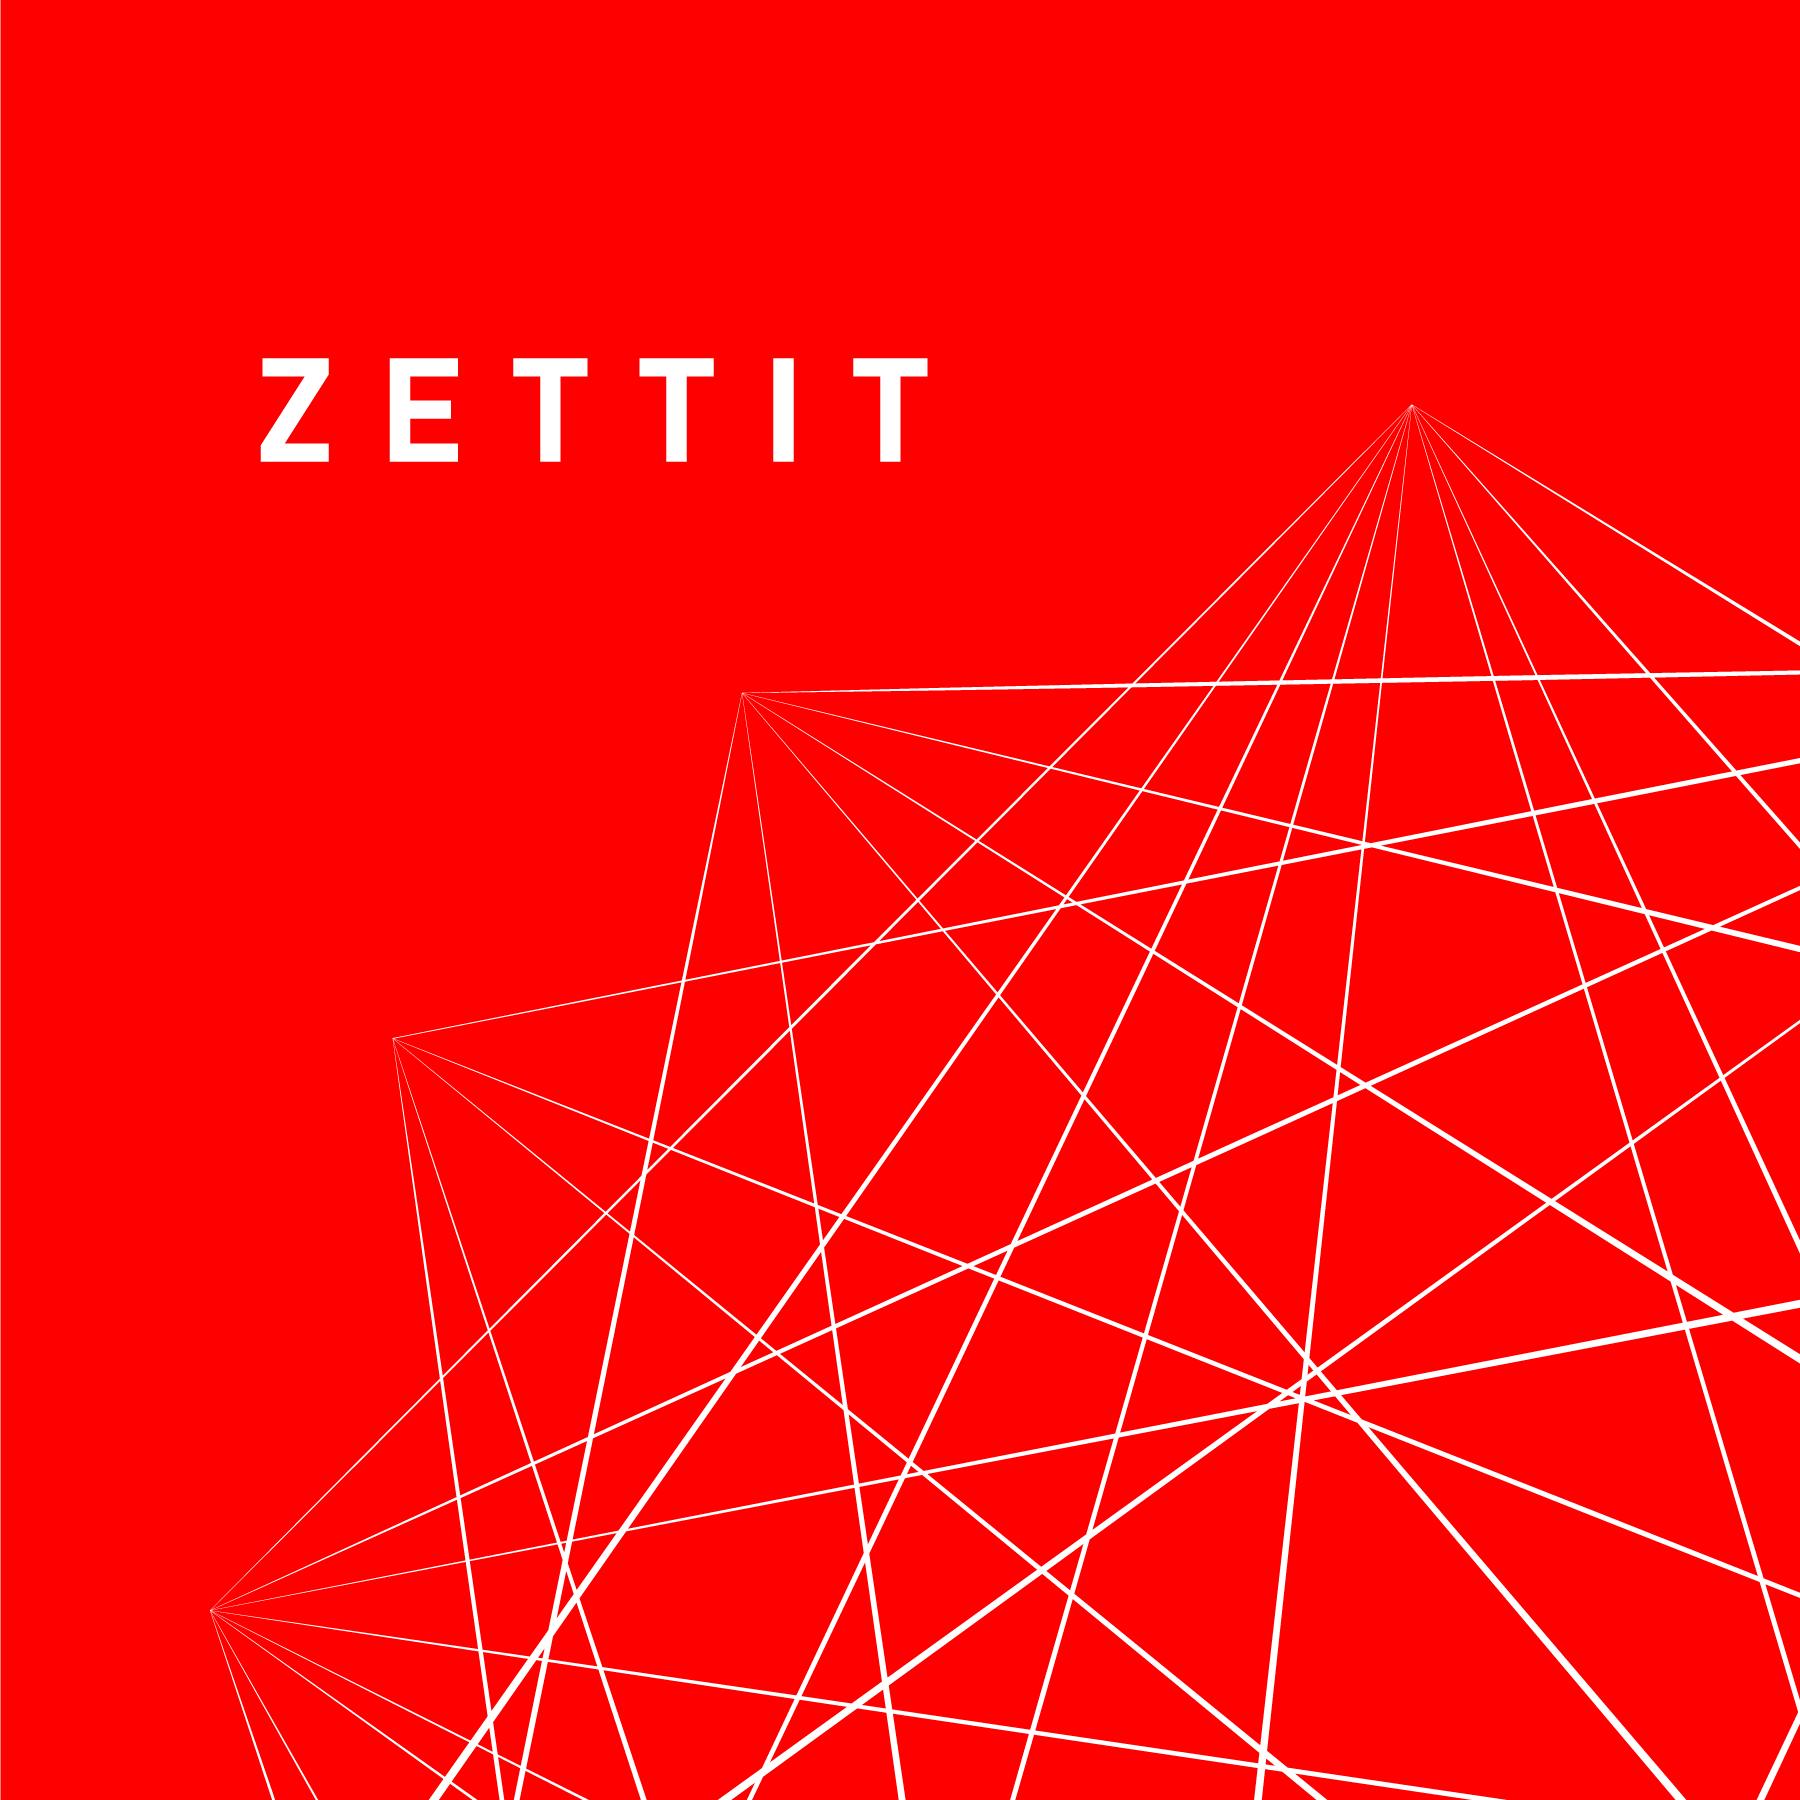 Zettit - Duplicate